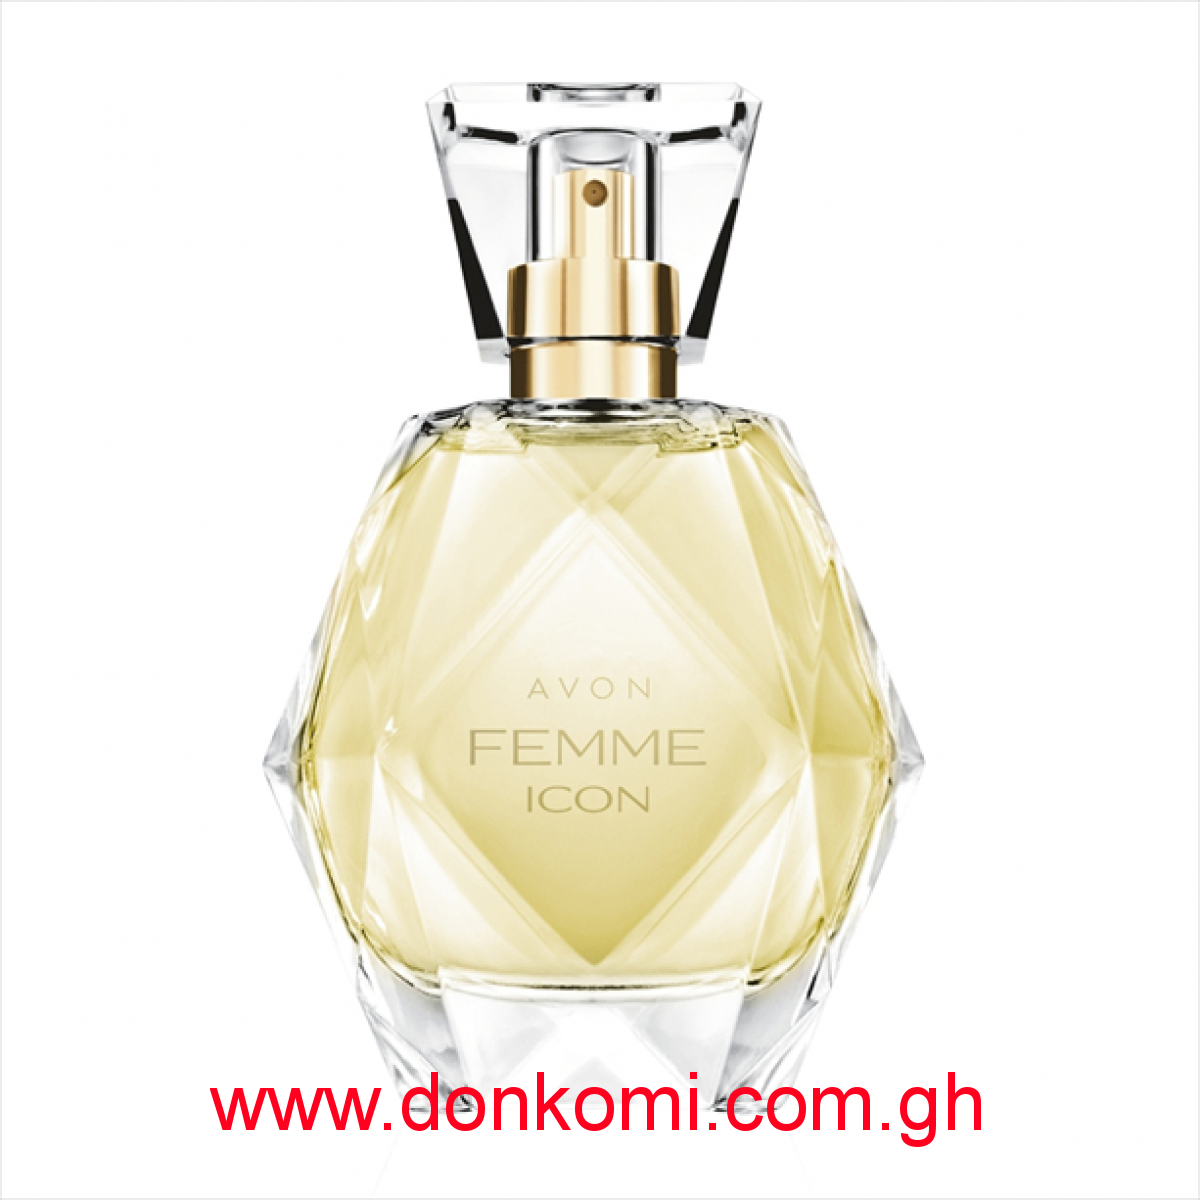 Avon Femme Icon Eau de Parfum Spray